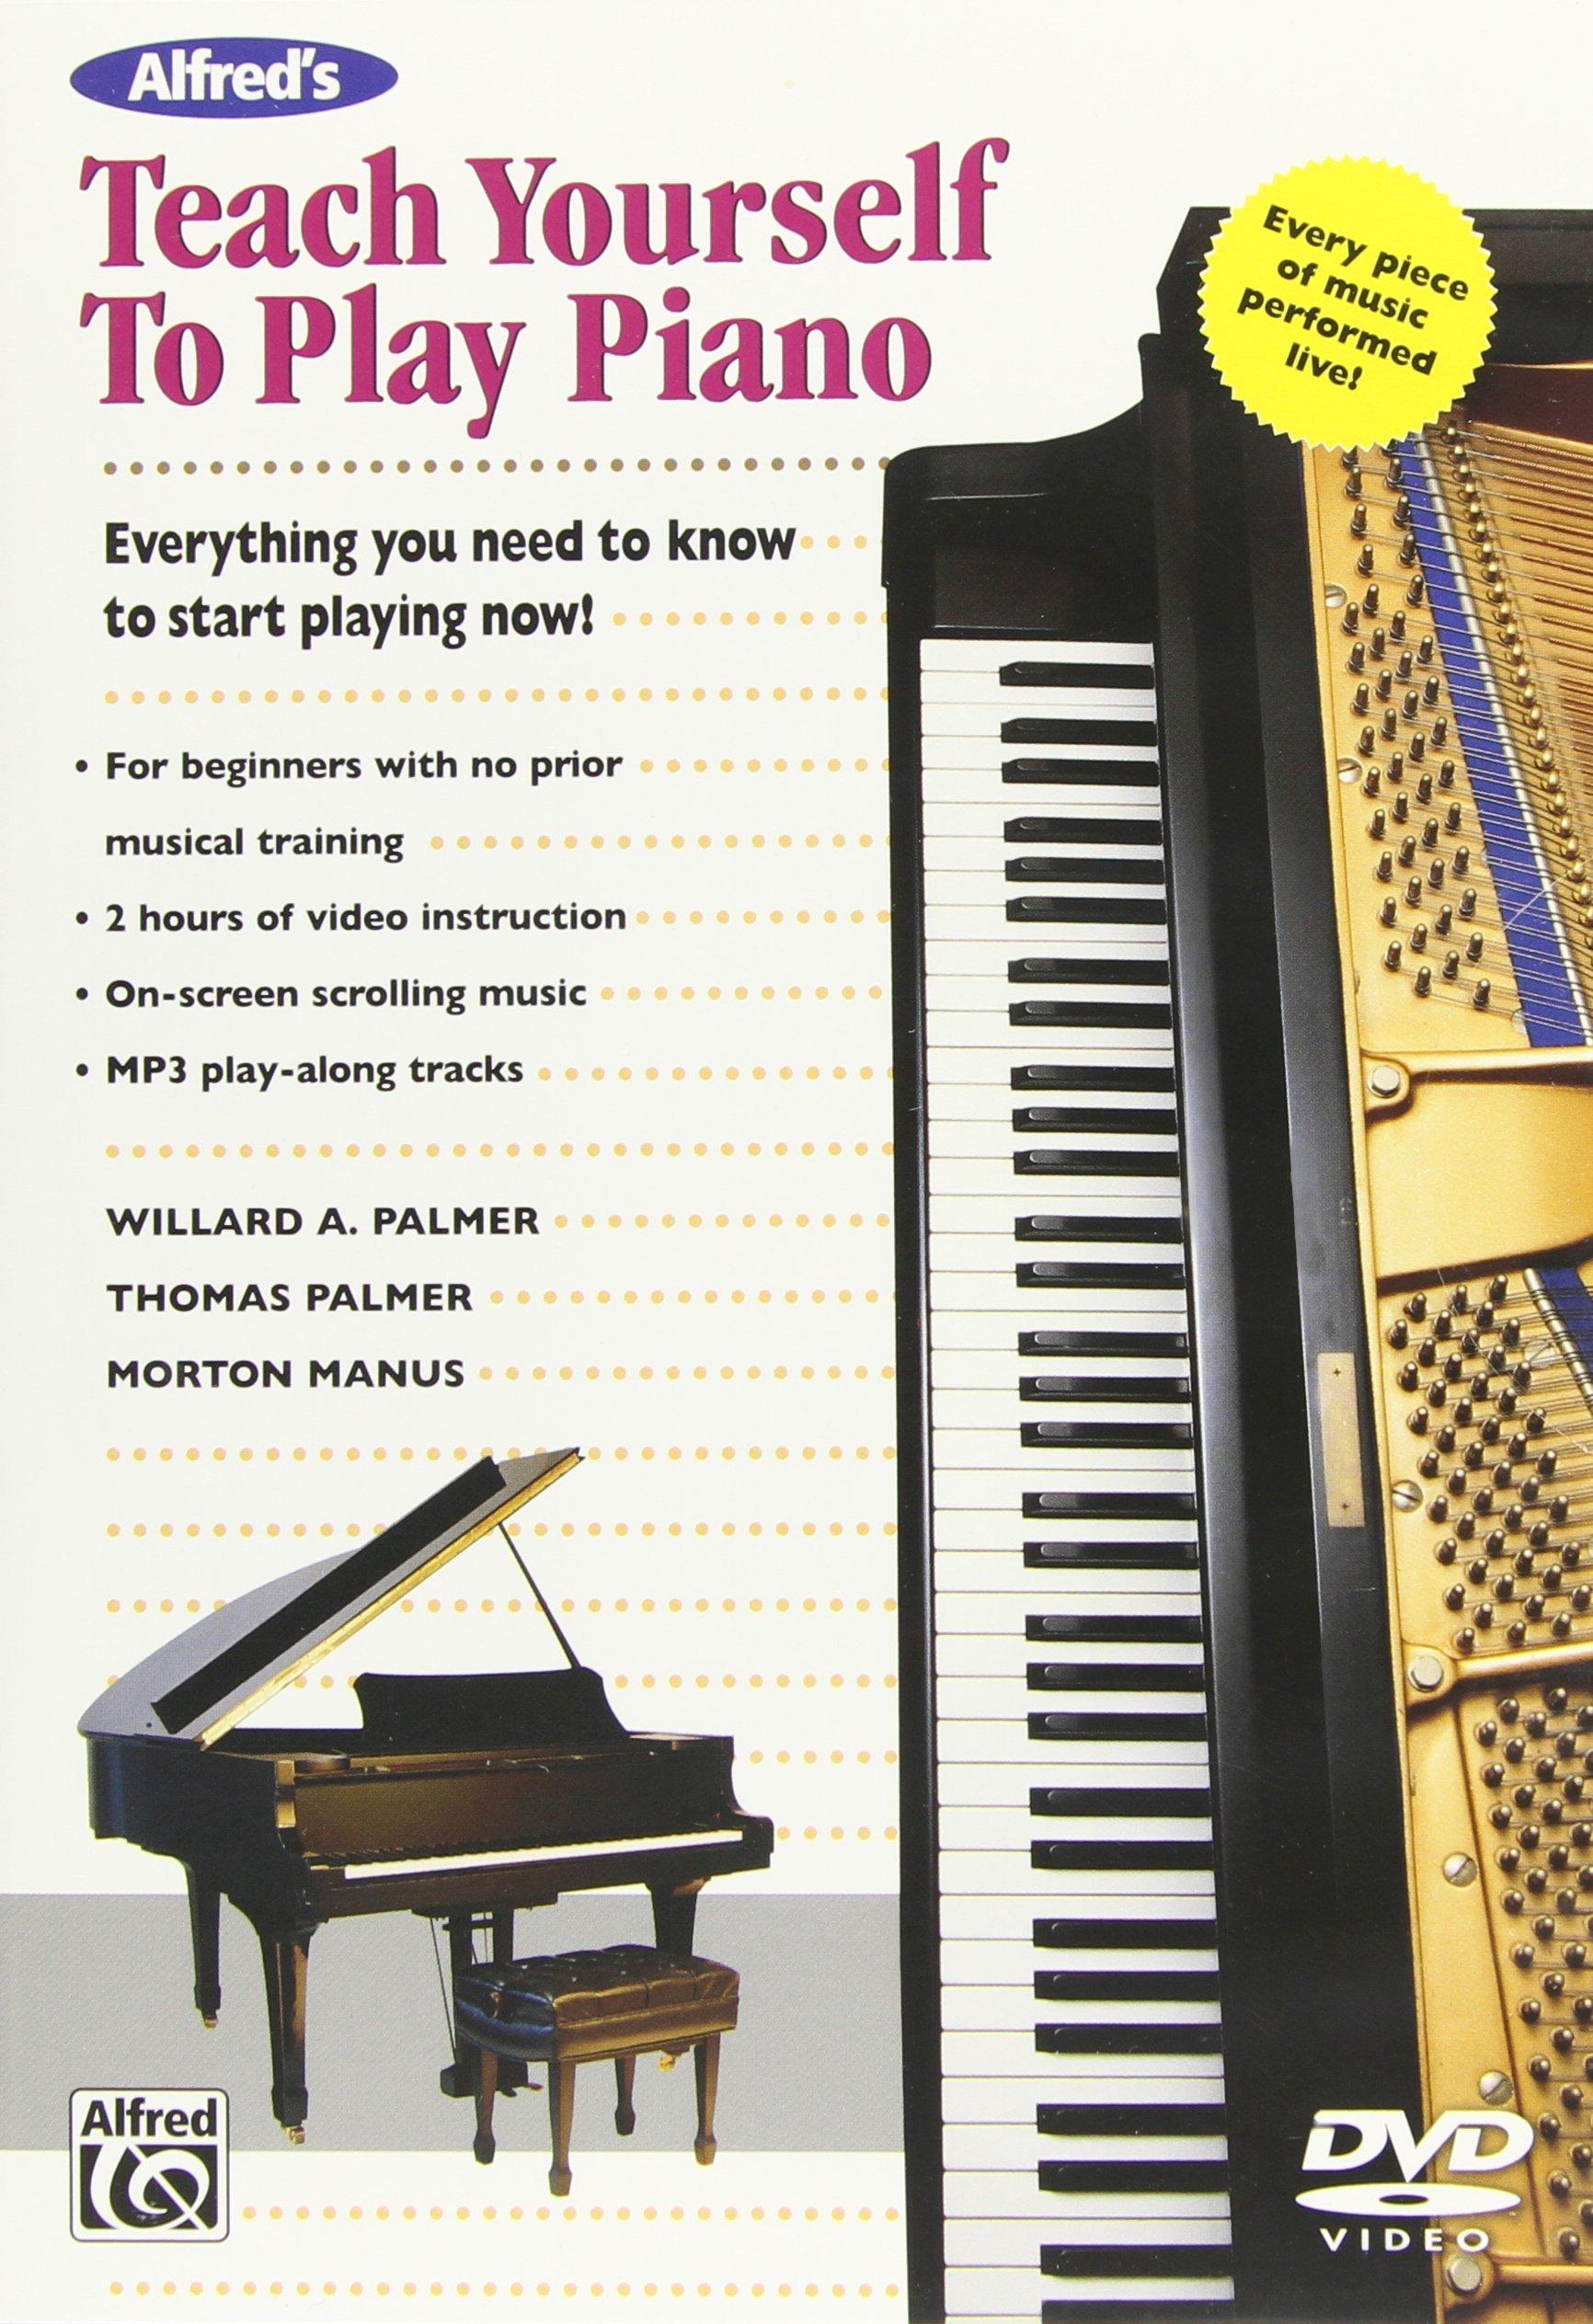 Yamaha DGX660 Digital Piano Education Bundle, Black with Yamaha BB1 Bench and Dust Cover by YAMAHA (Image #6)